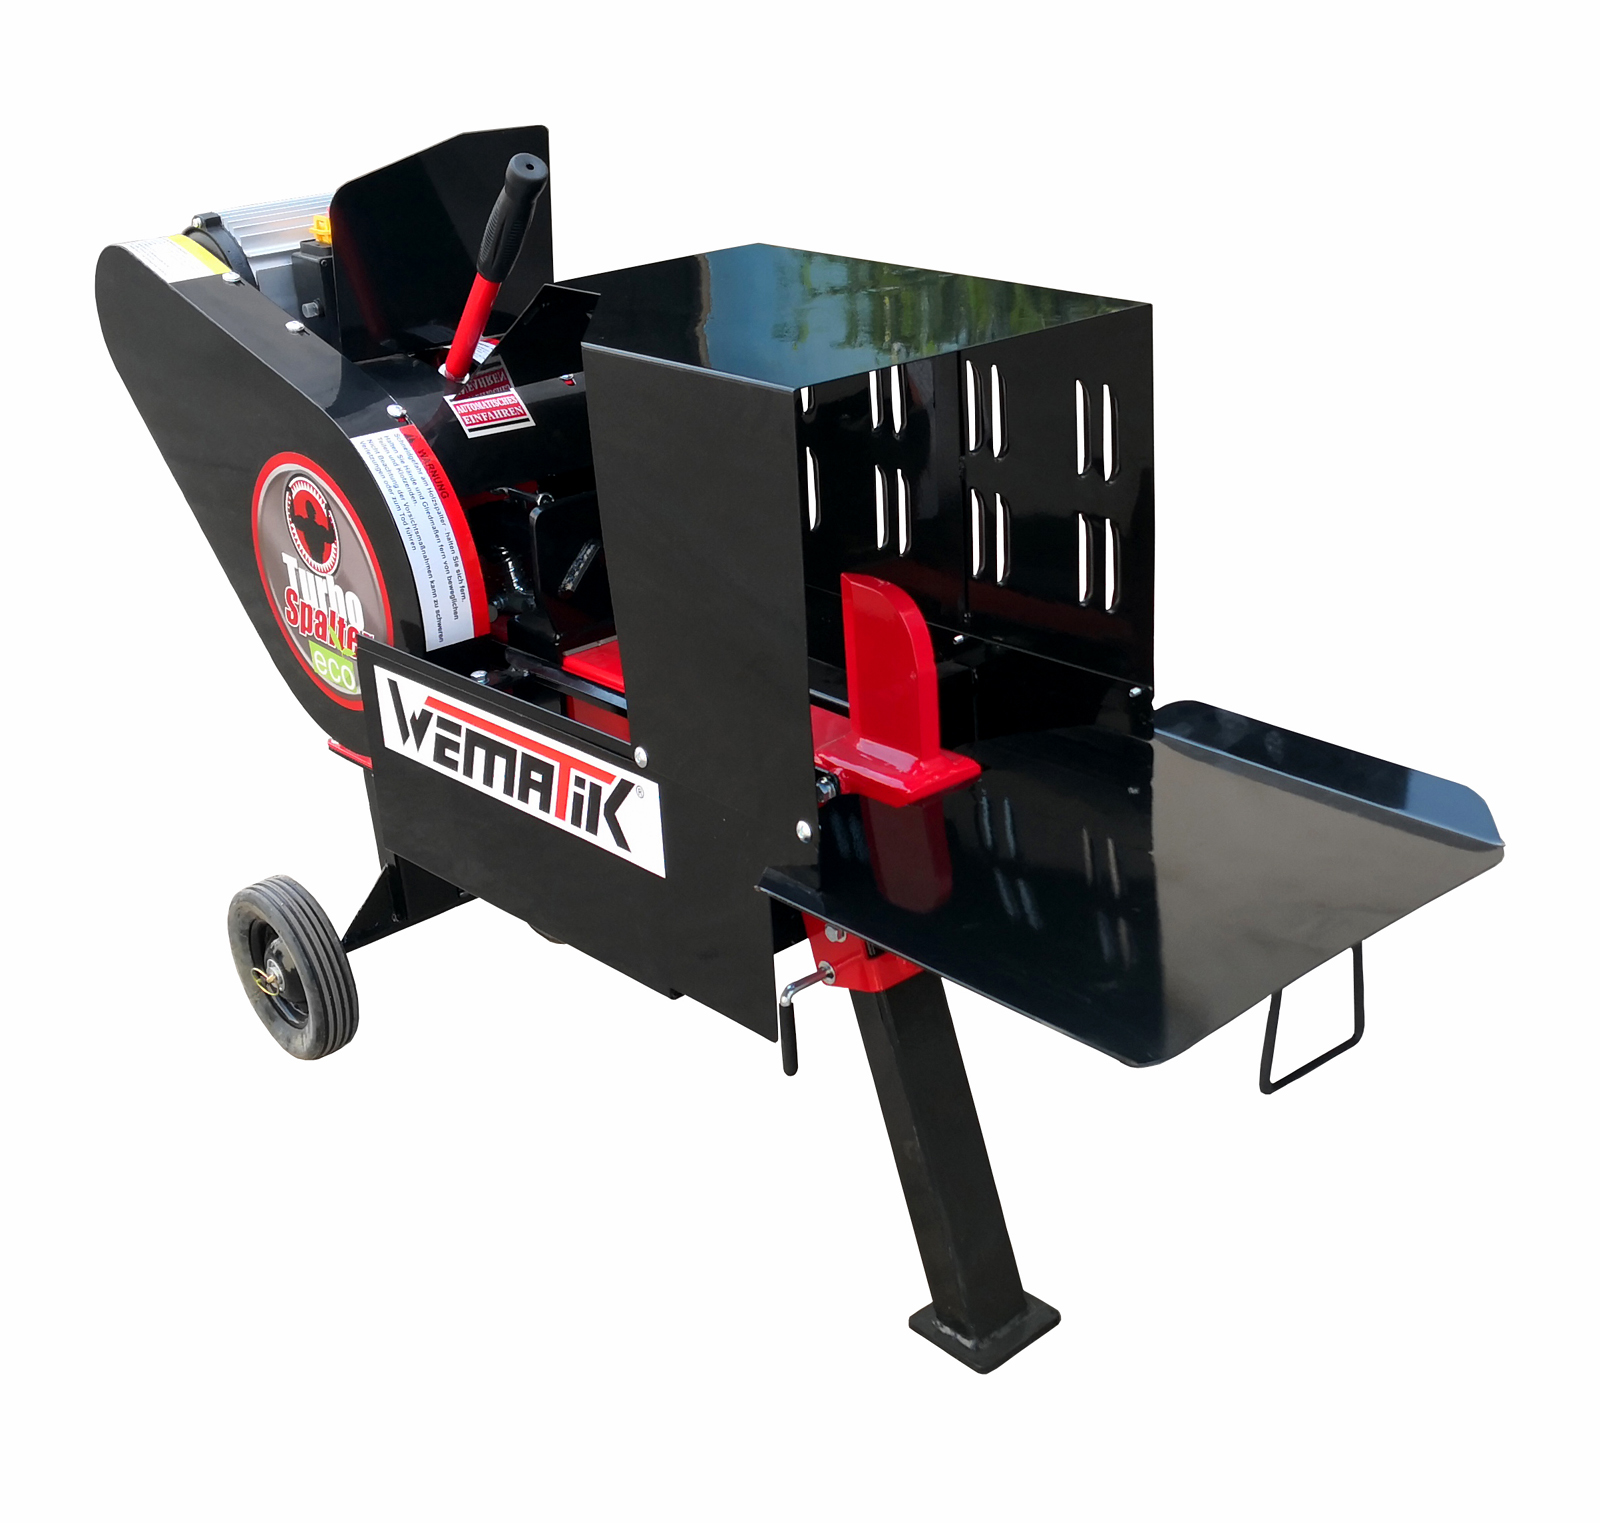 Turbo Spalter ECO Schwungradspalter 10 Tonnen